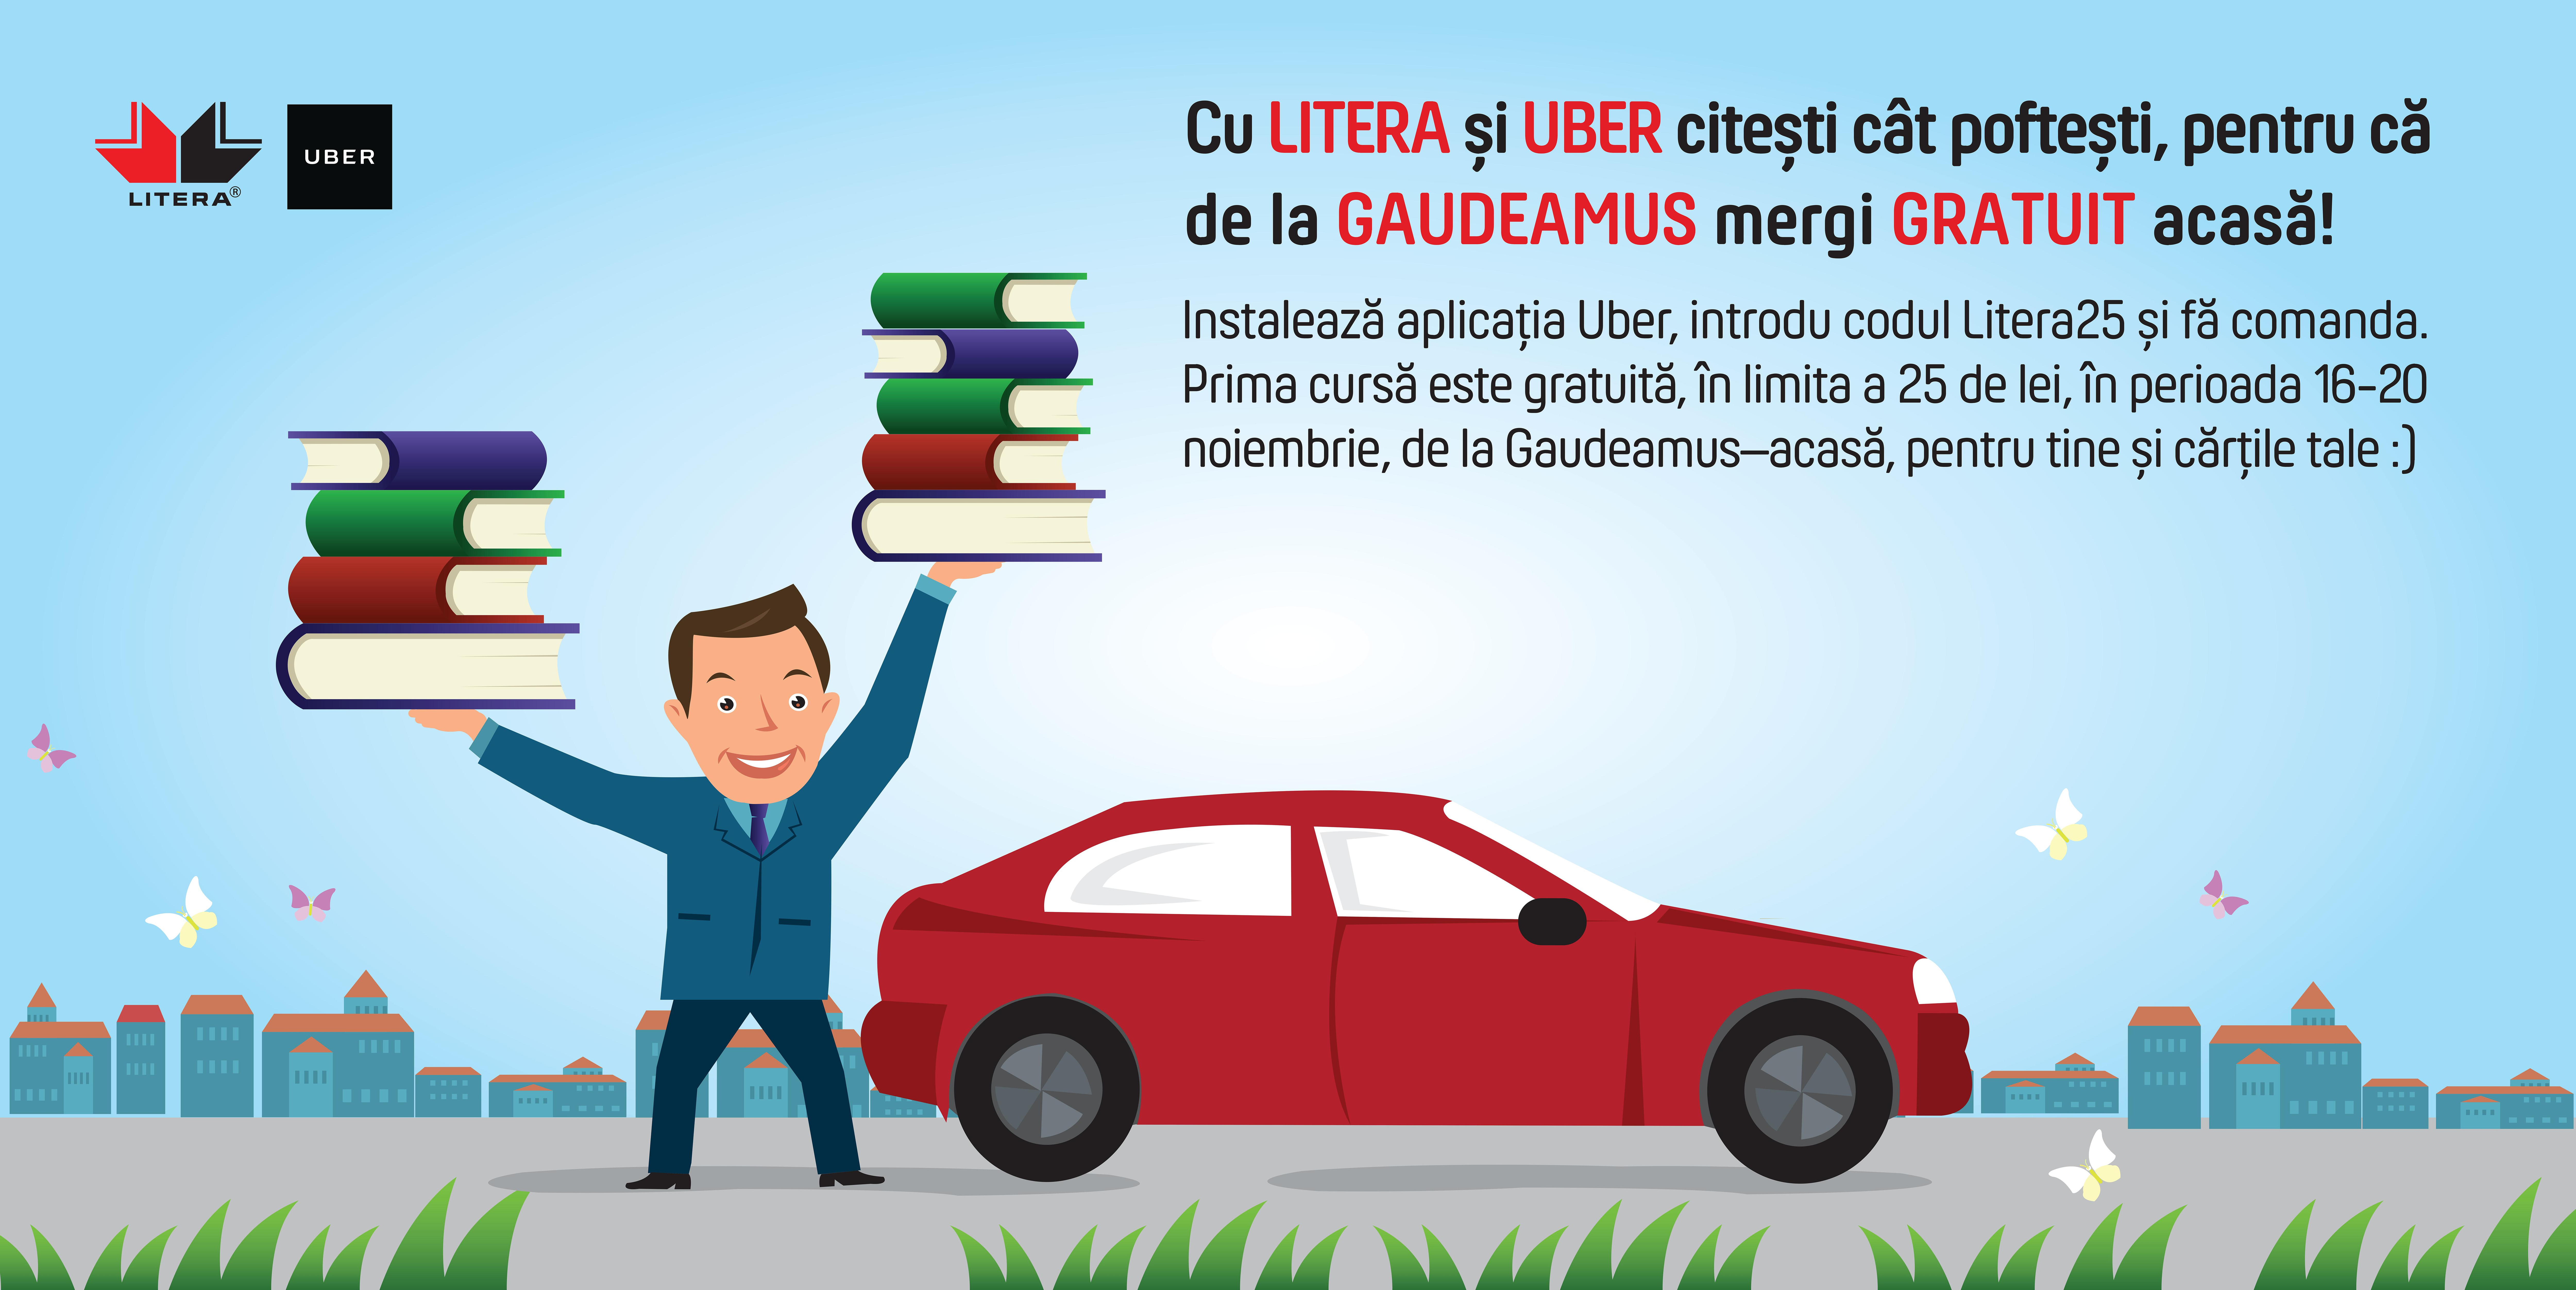 imagine-litera-uber